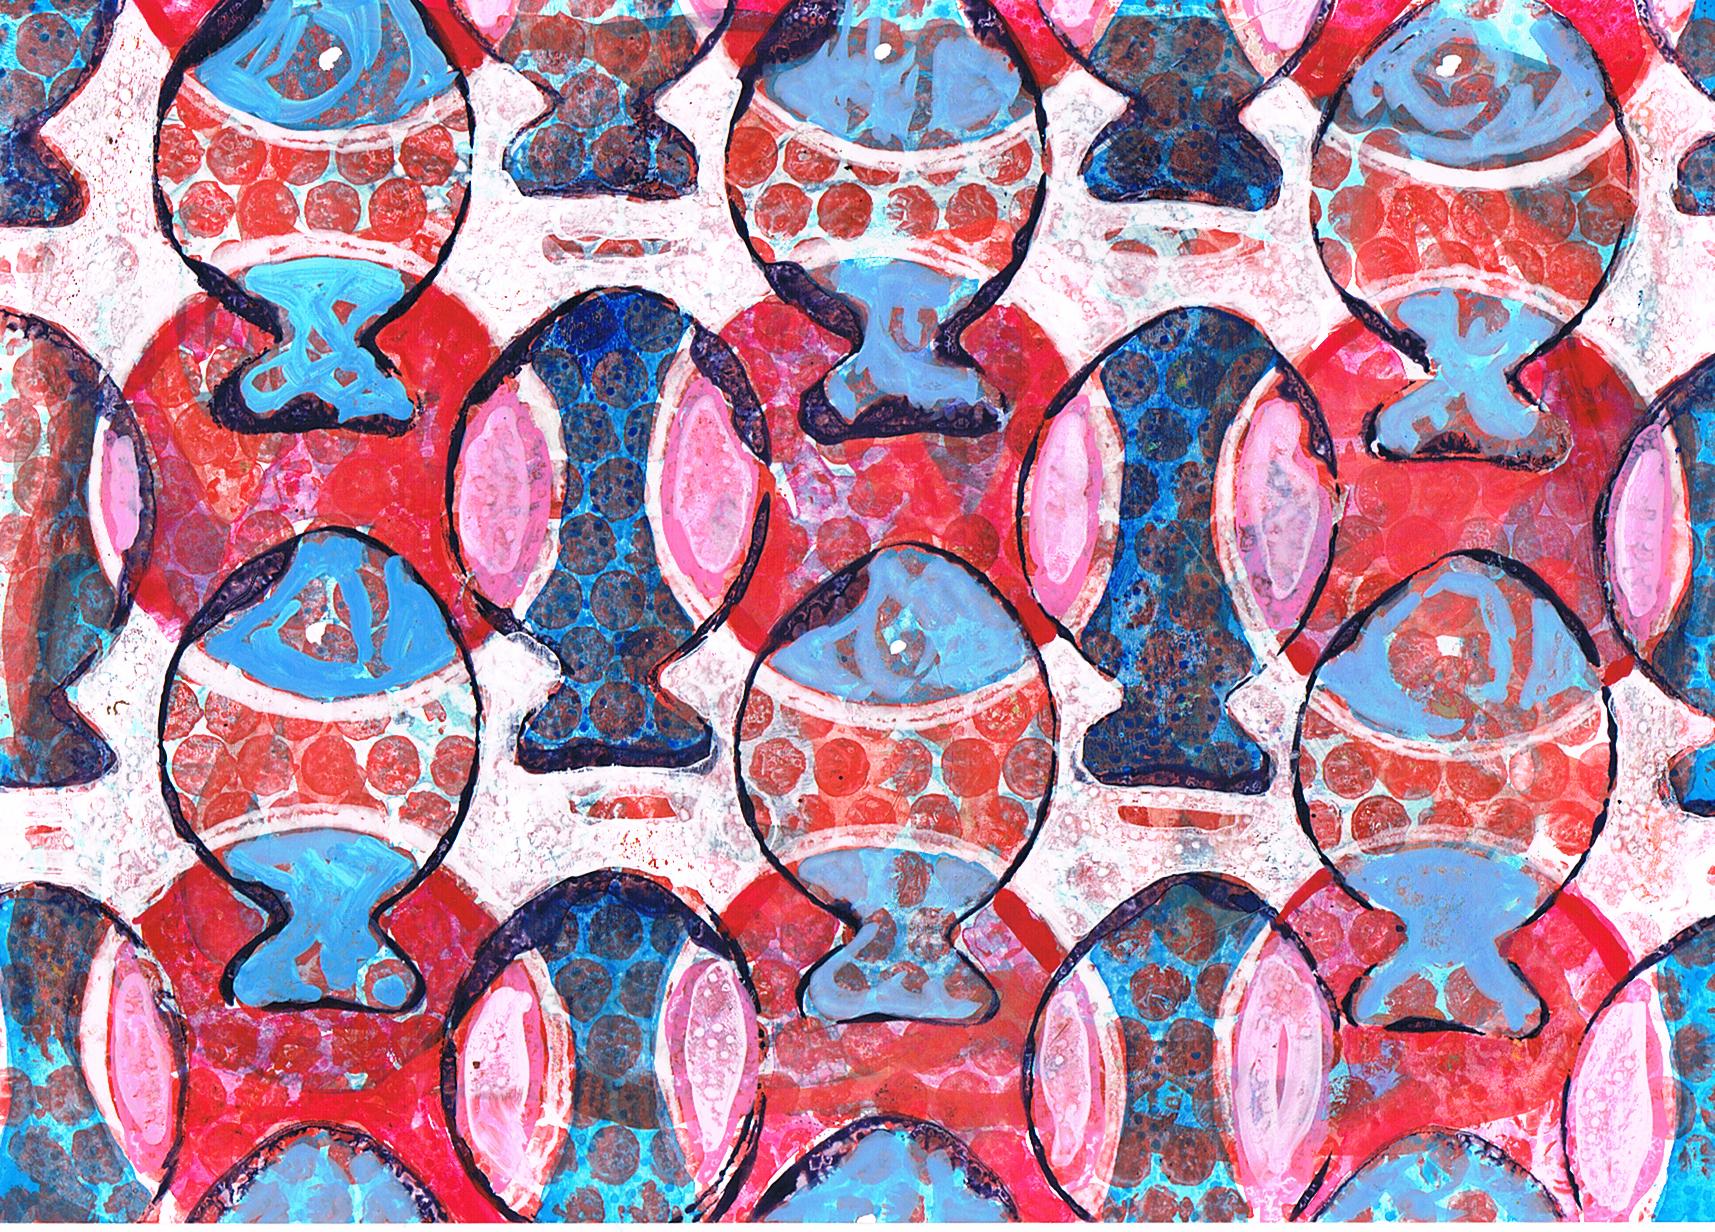 Christmasfish, gouache on stonepaper, 21x30cm